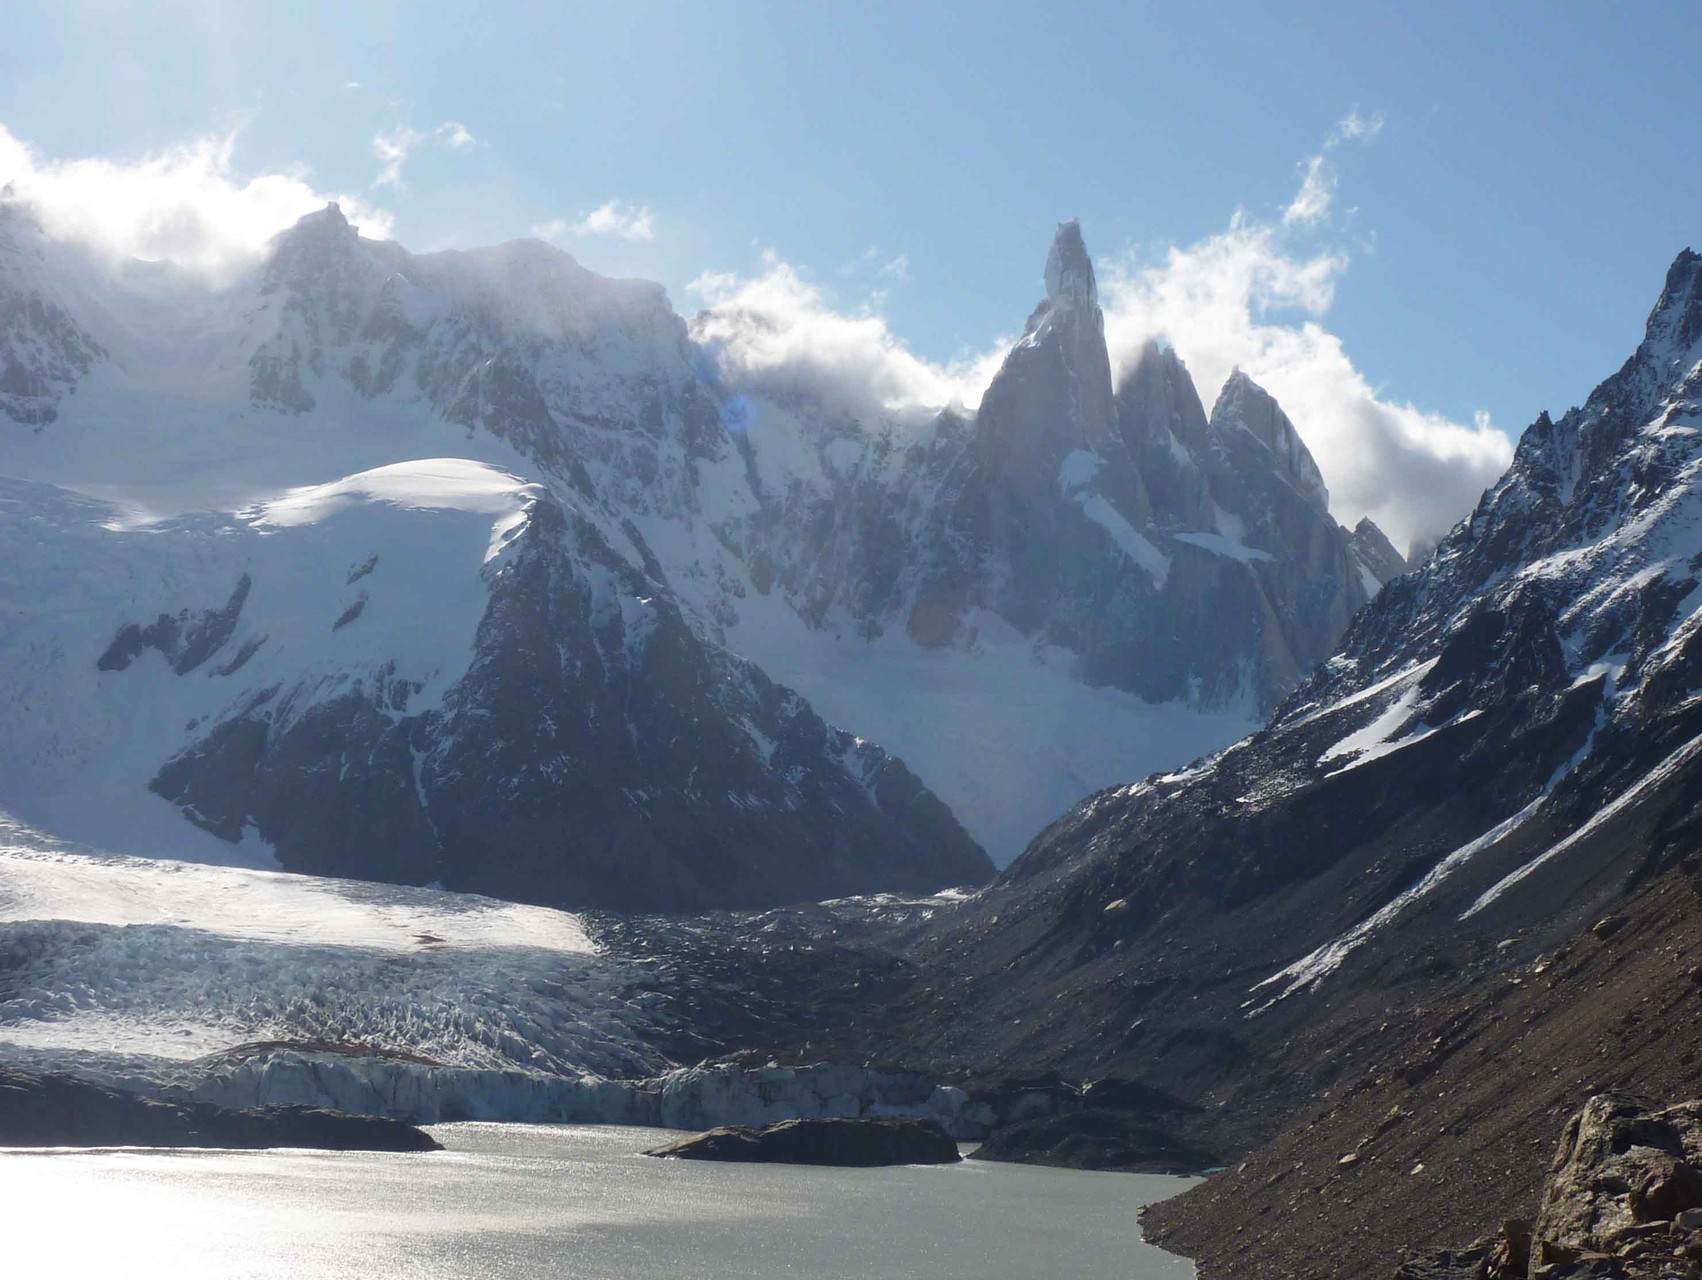 Le Cerro Torre (3133 m) vu depuis les rives de la laguna Torre